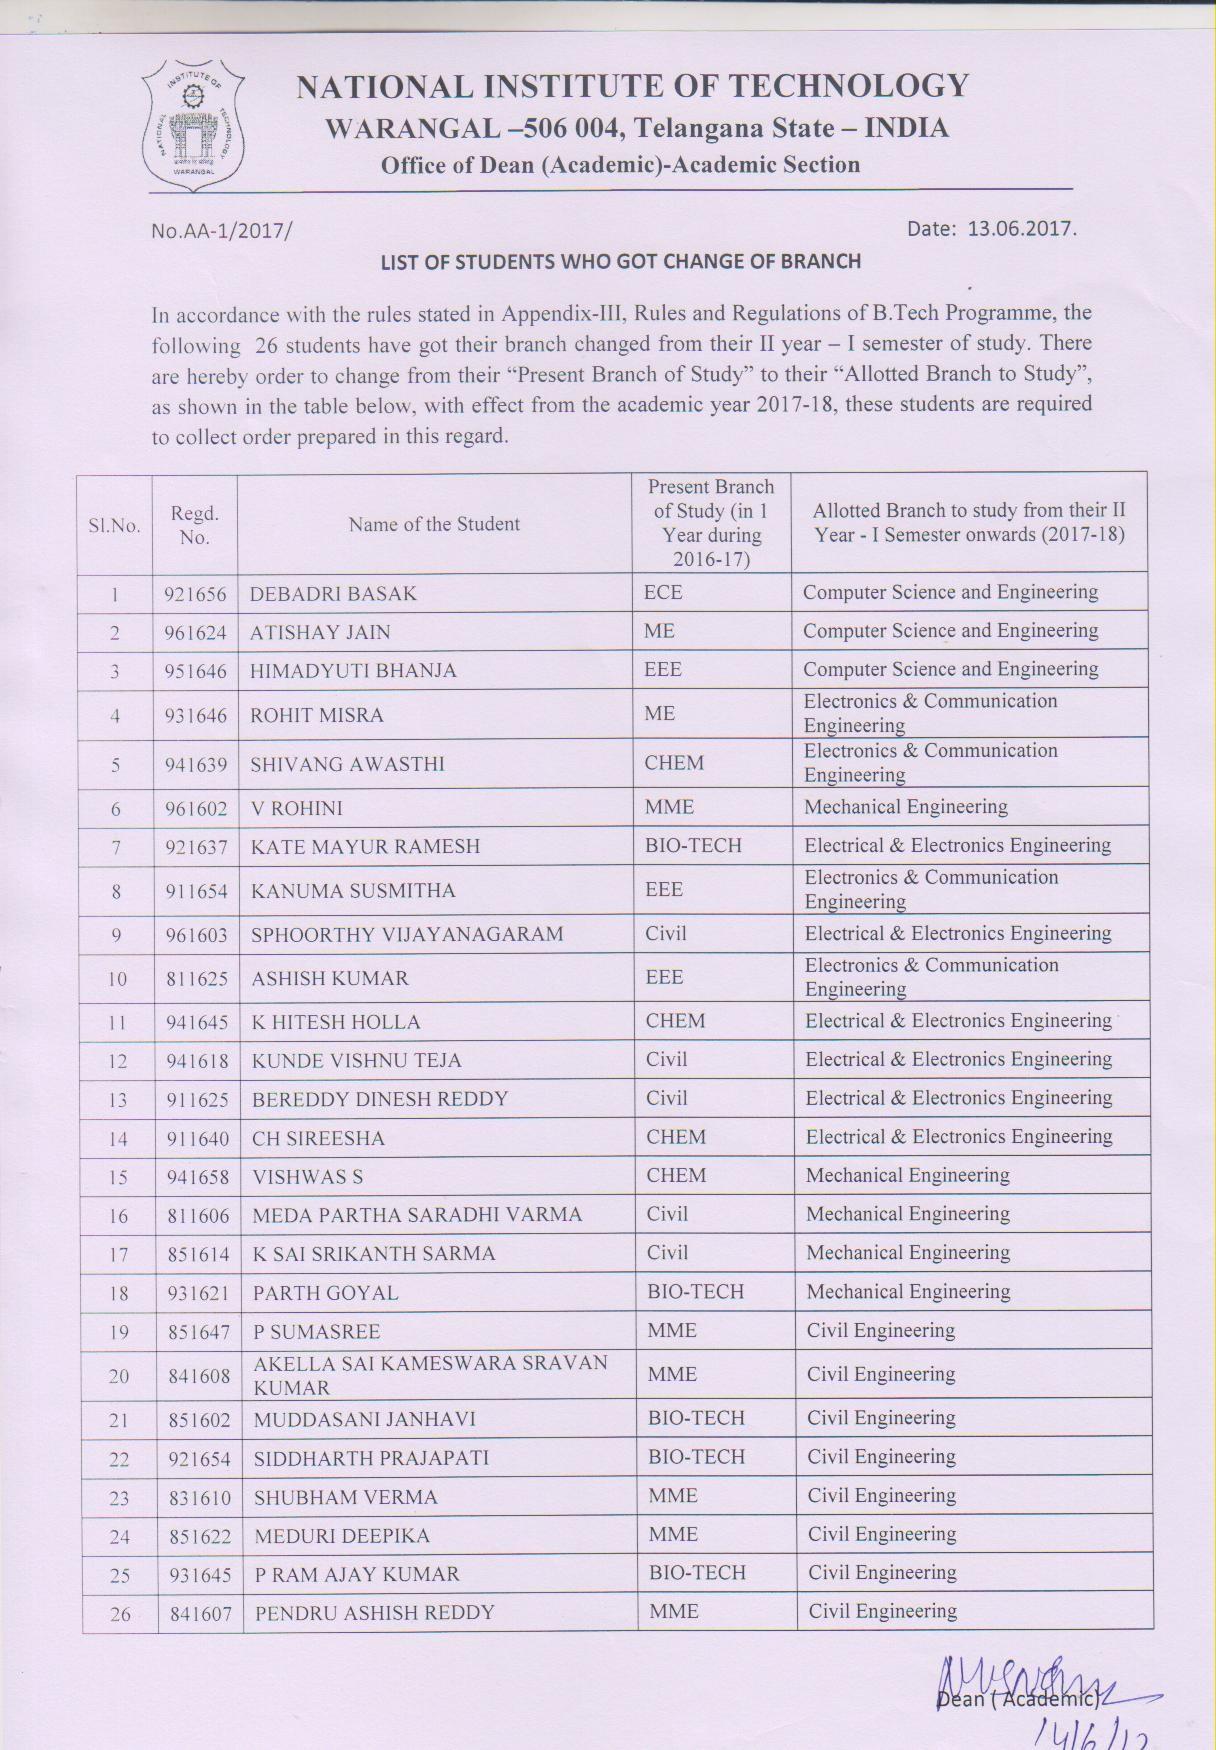 Ssc Calendar 2019 Pdf Download Más Populares National Institute Of Technology Of Ssc Calendar 2019 Pdf Download Recientes Downloads Exam Result Routine Etc